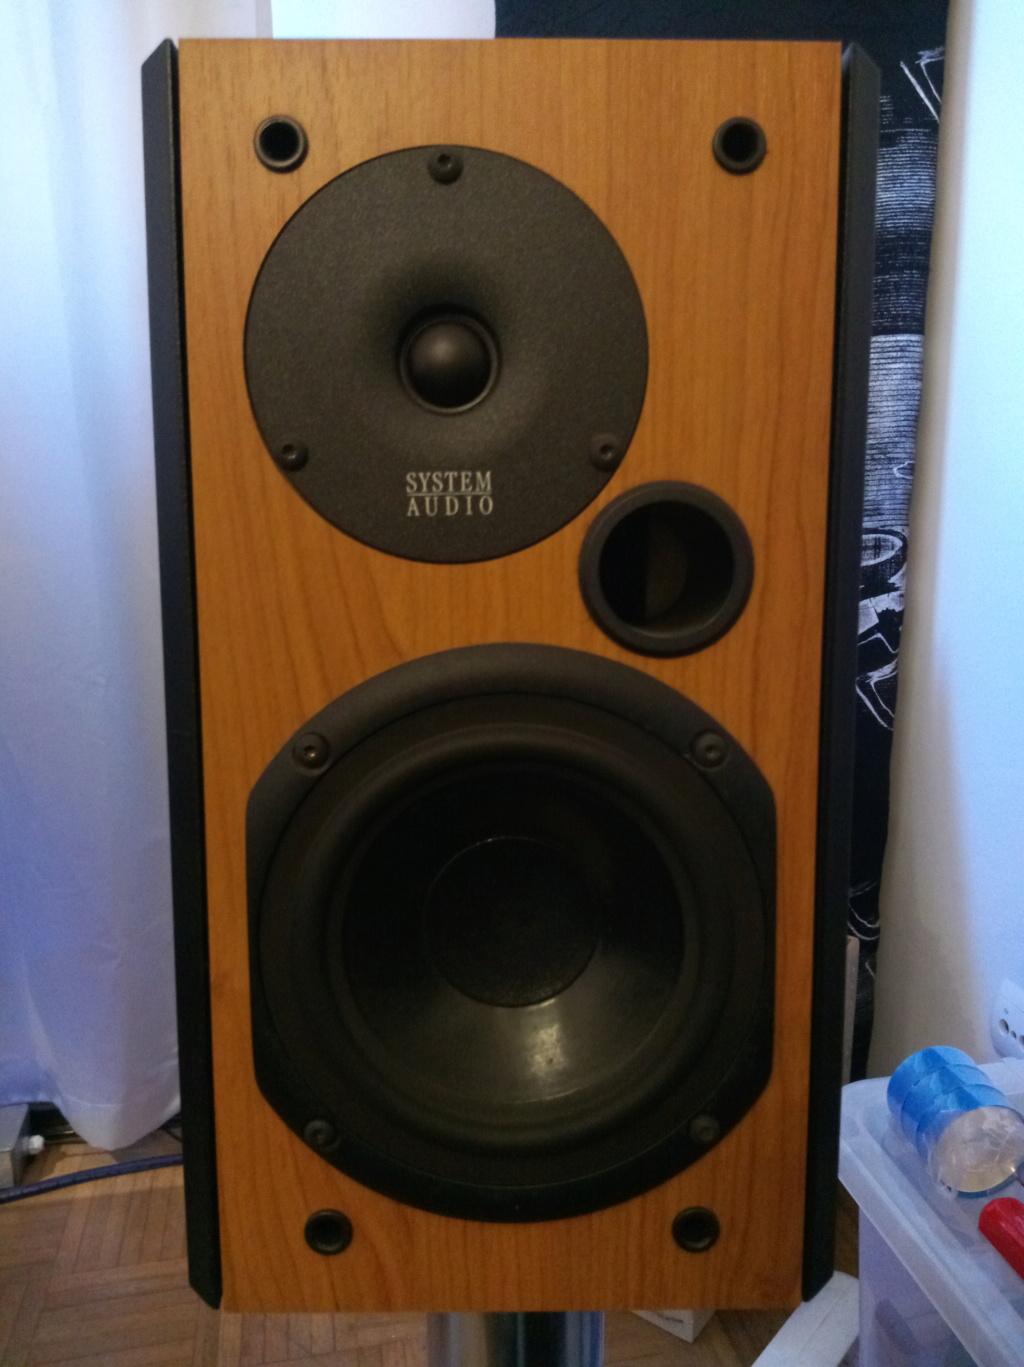 Colunas System Audio 1110 Img_2027